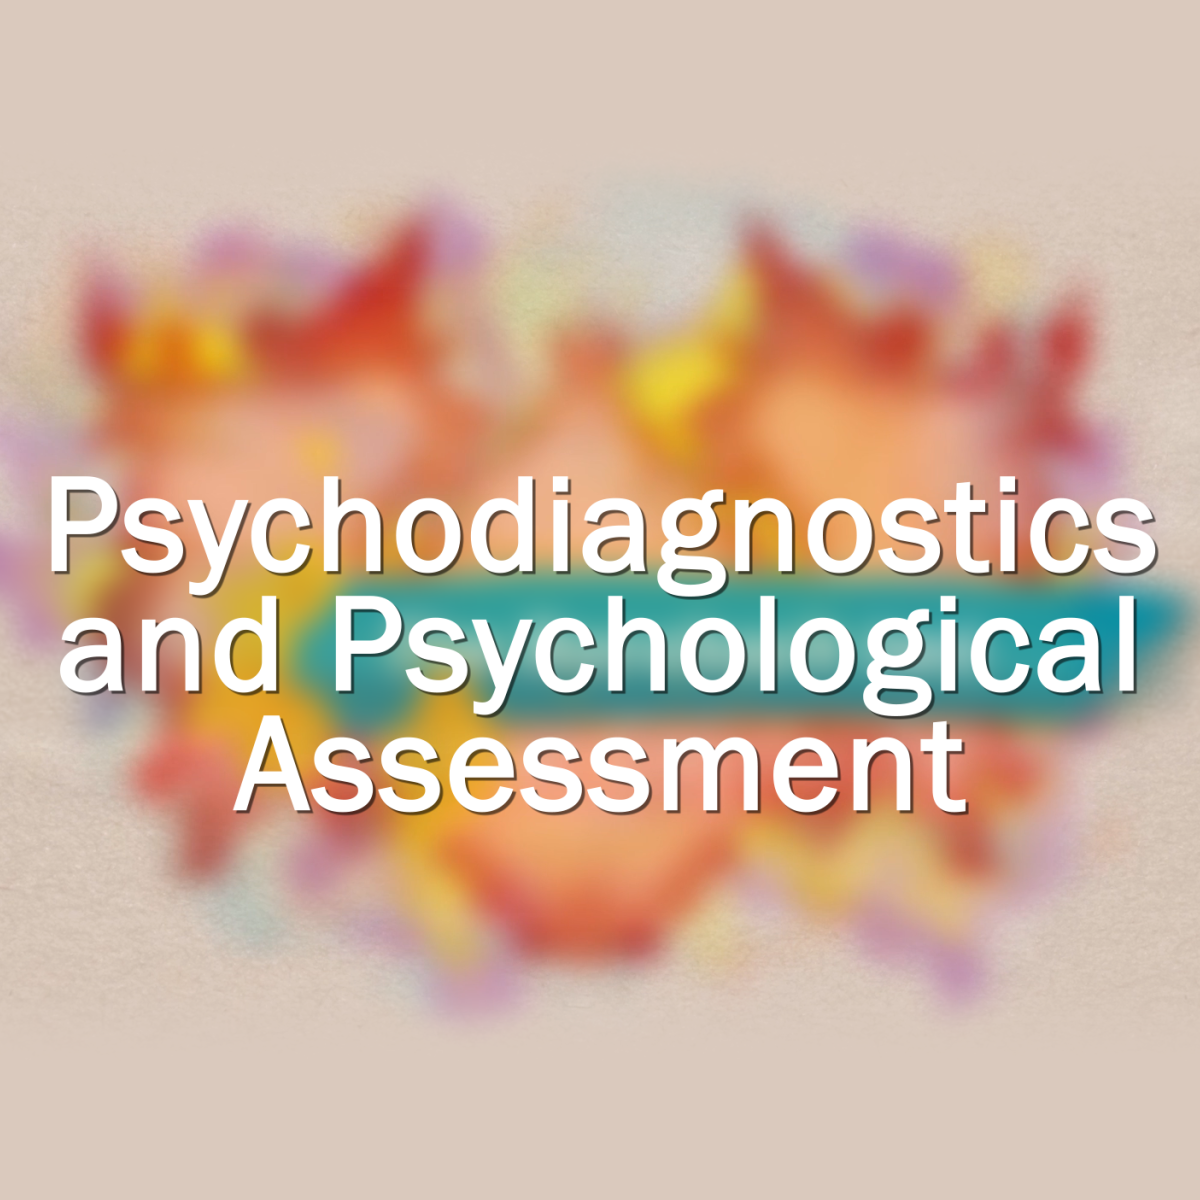 Psychodiagnostics and Psychological Assessment